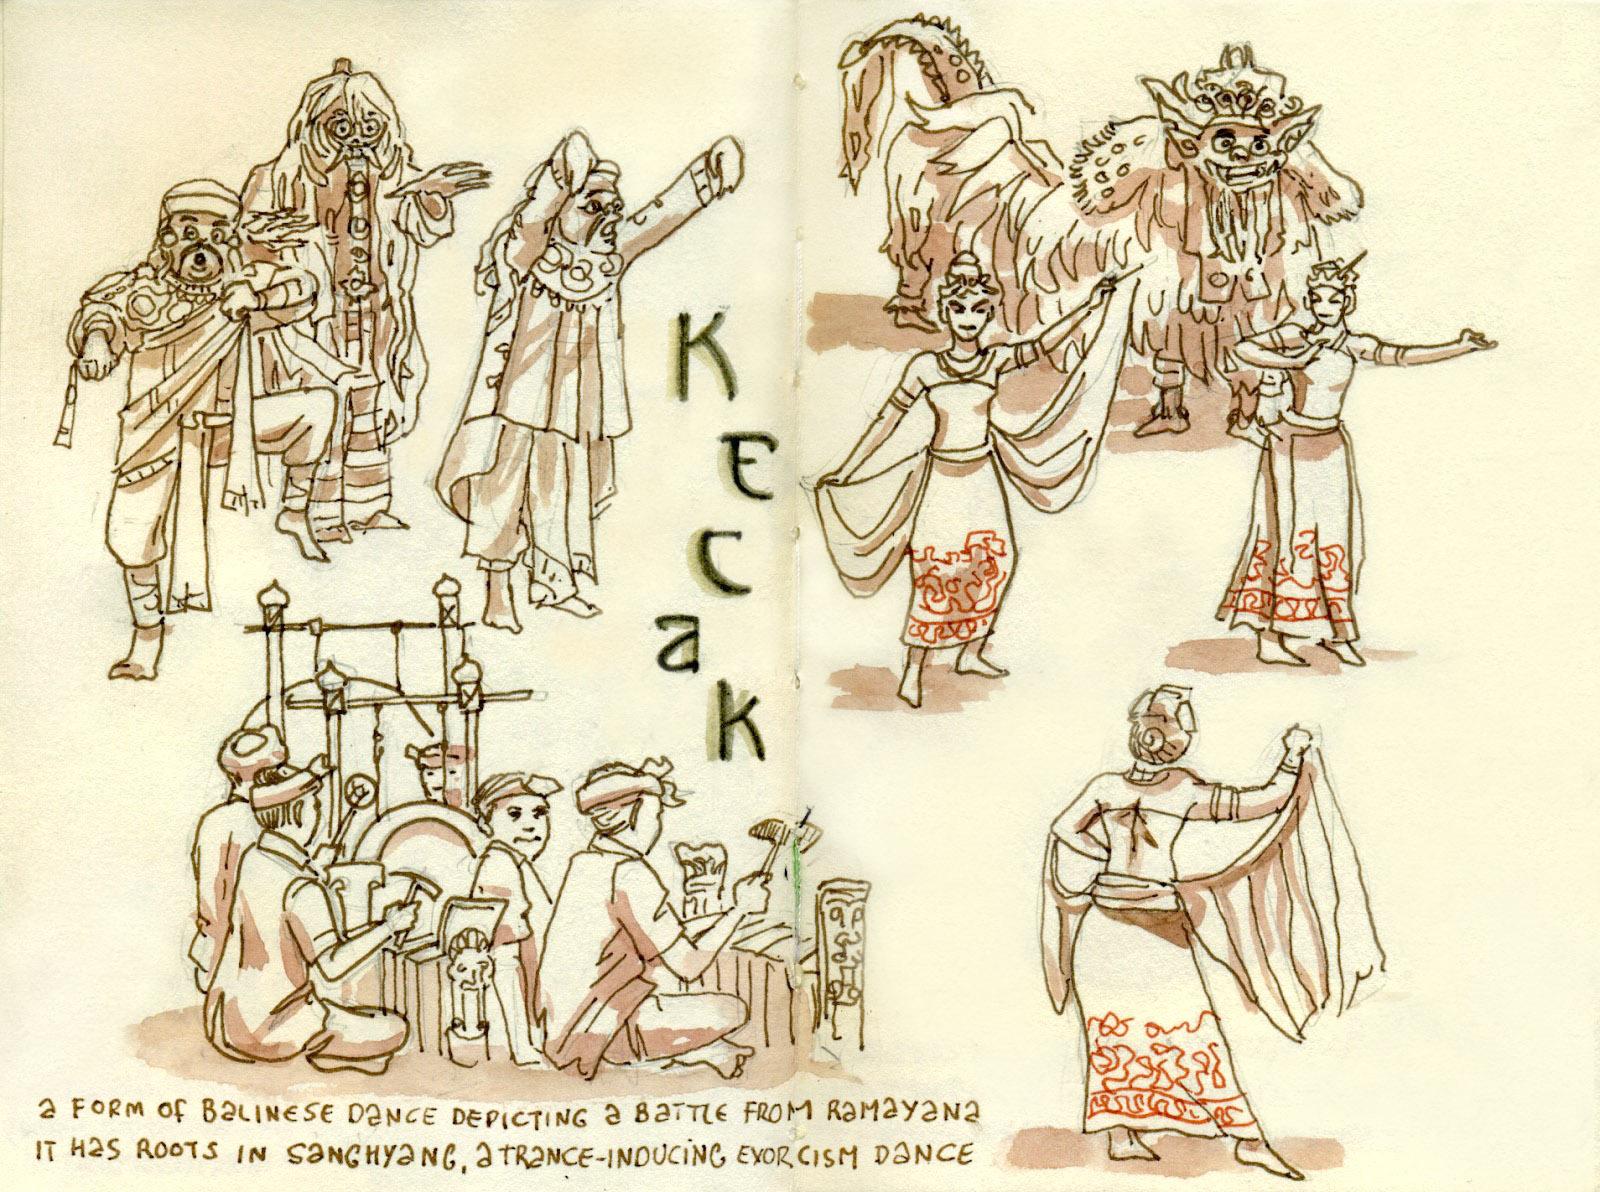 <b>Bali Ritual Dance</b>